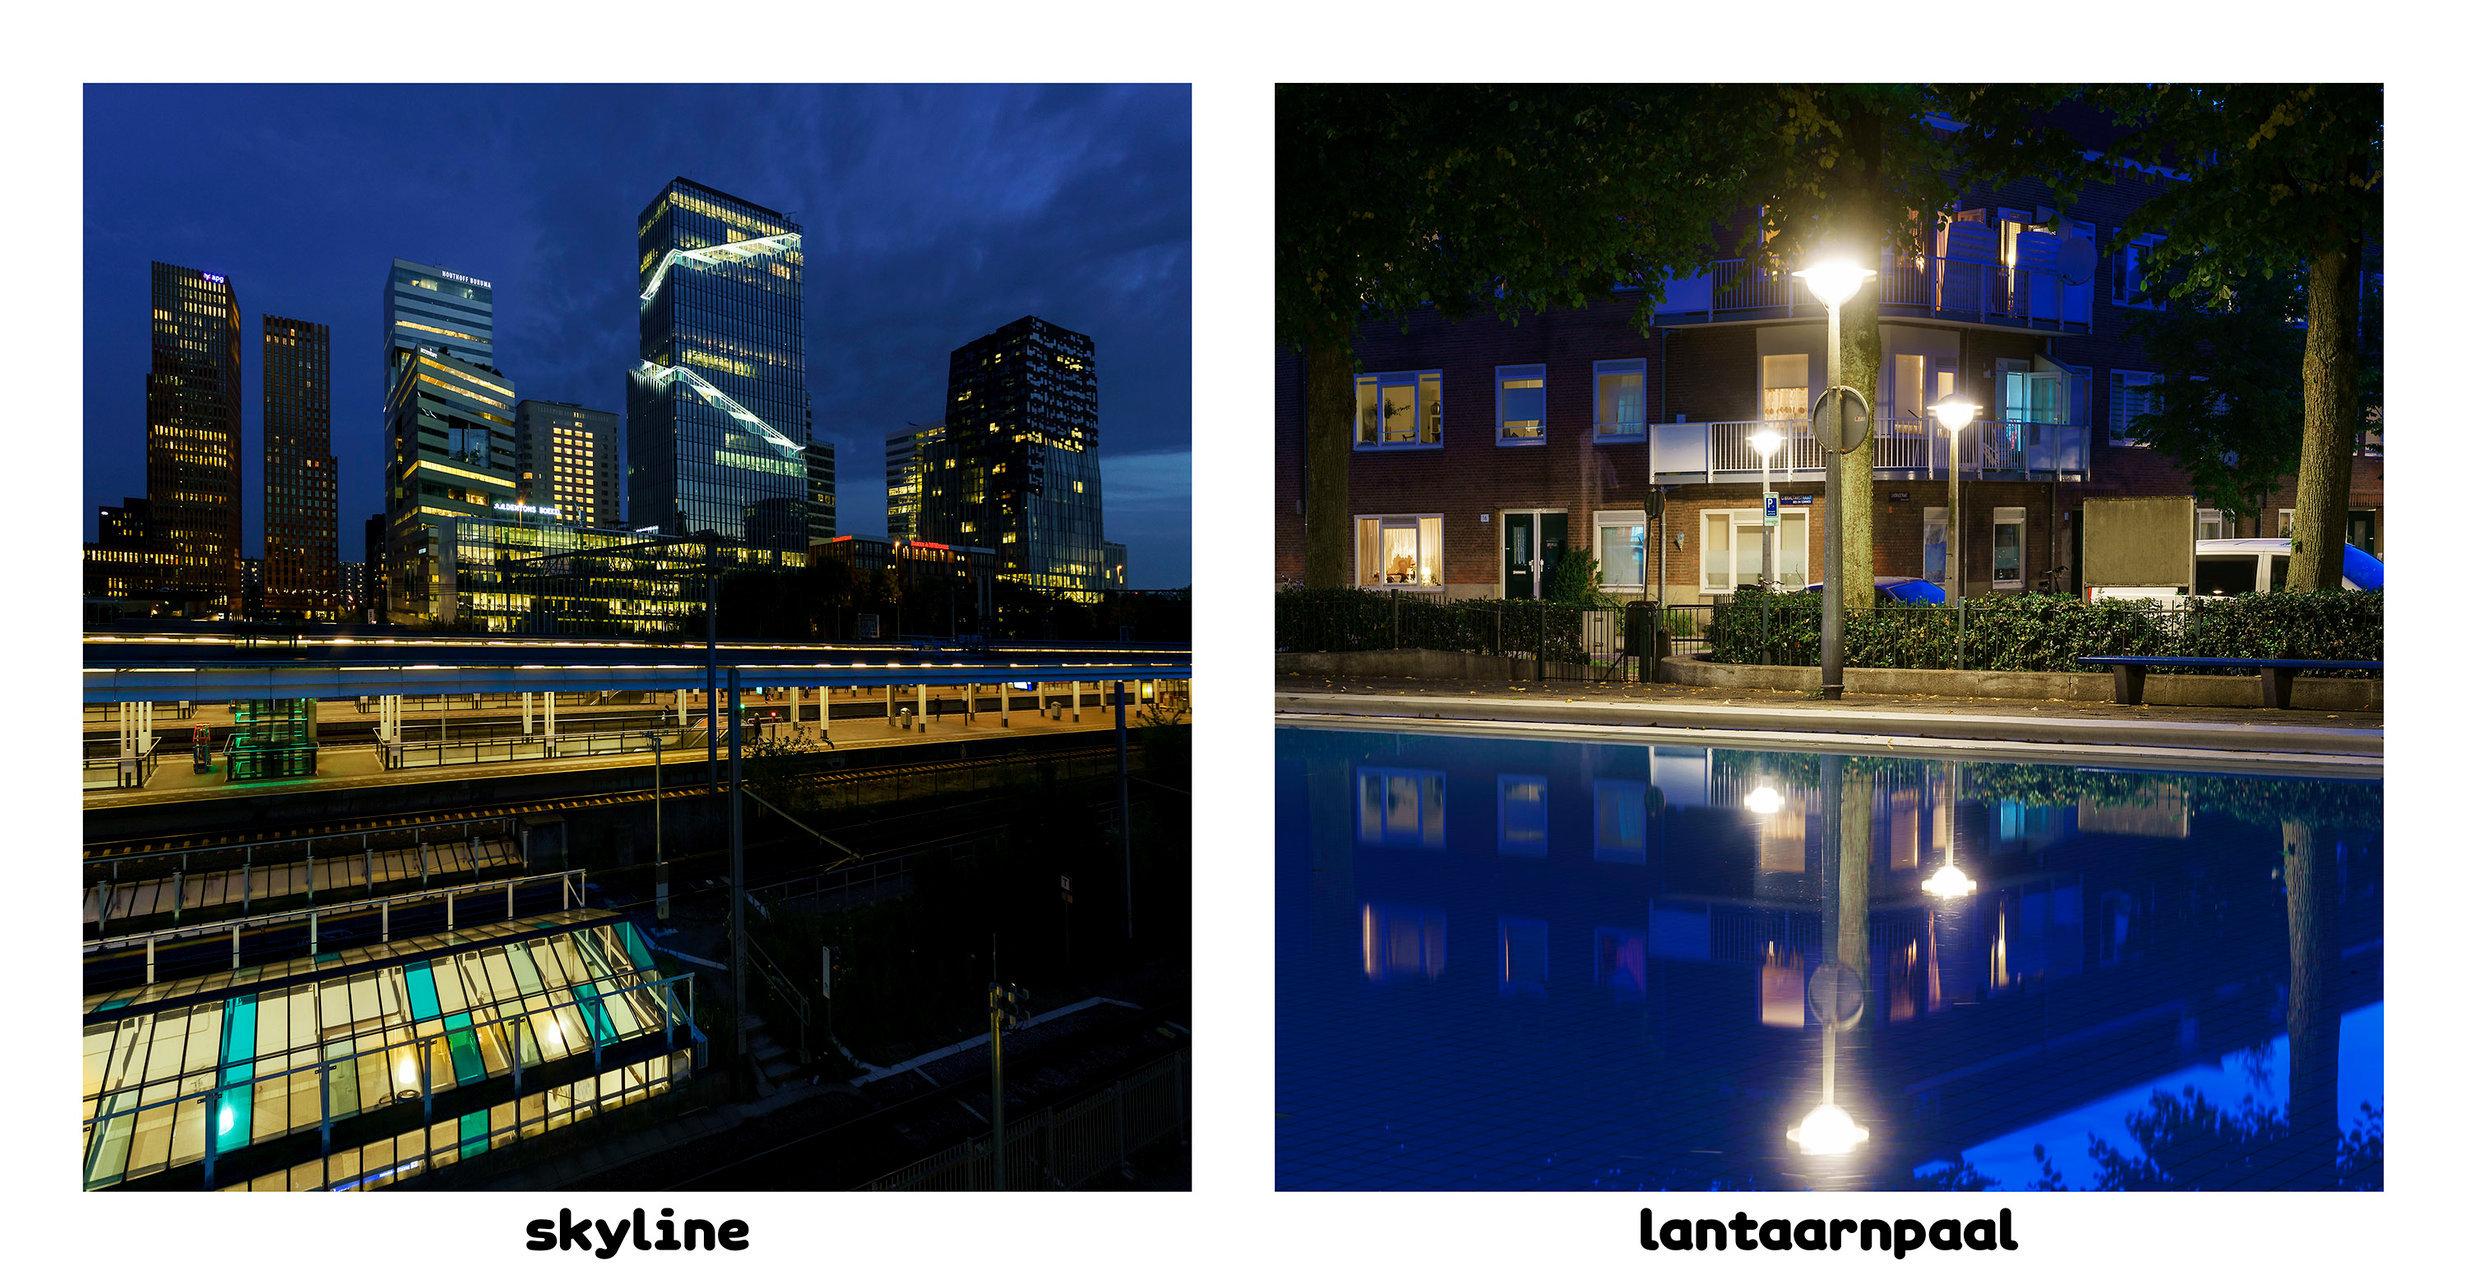 skyline-lantaarnpaal Amsterdamsedingen Immink-Faber.jpg